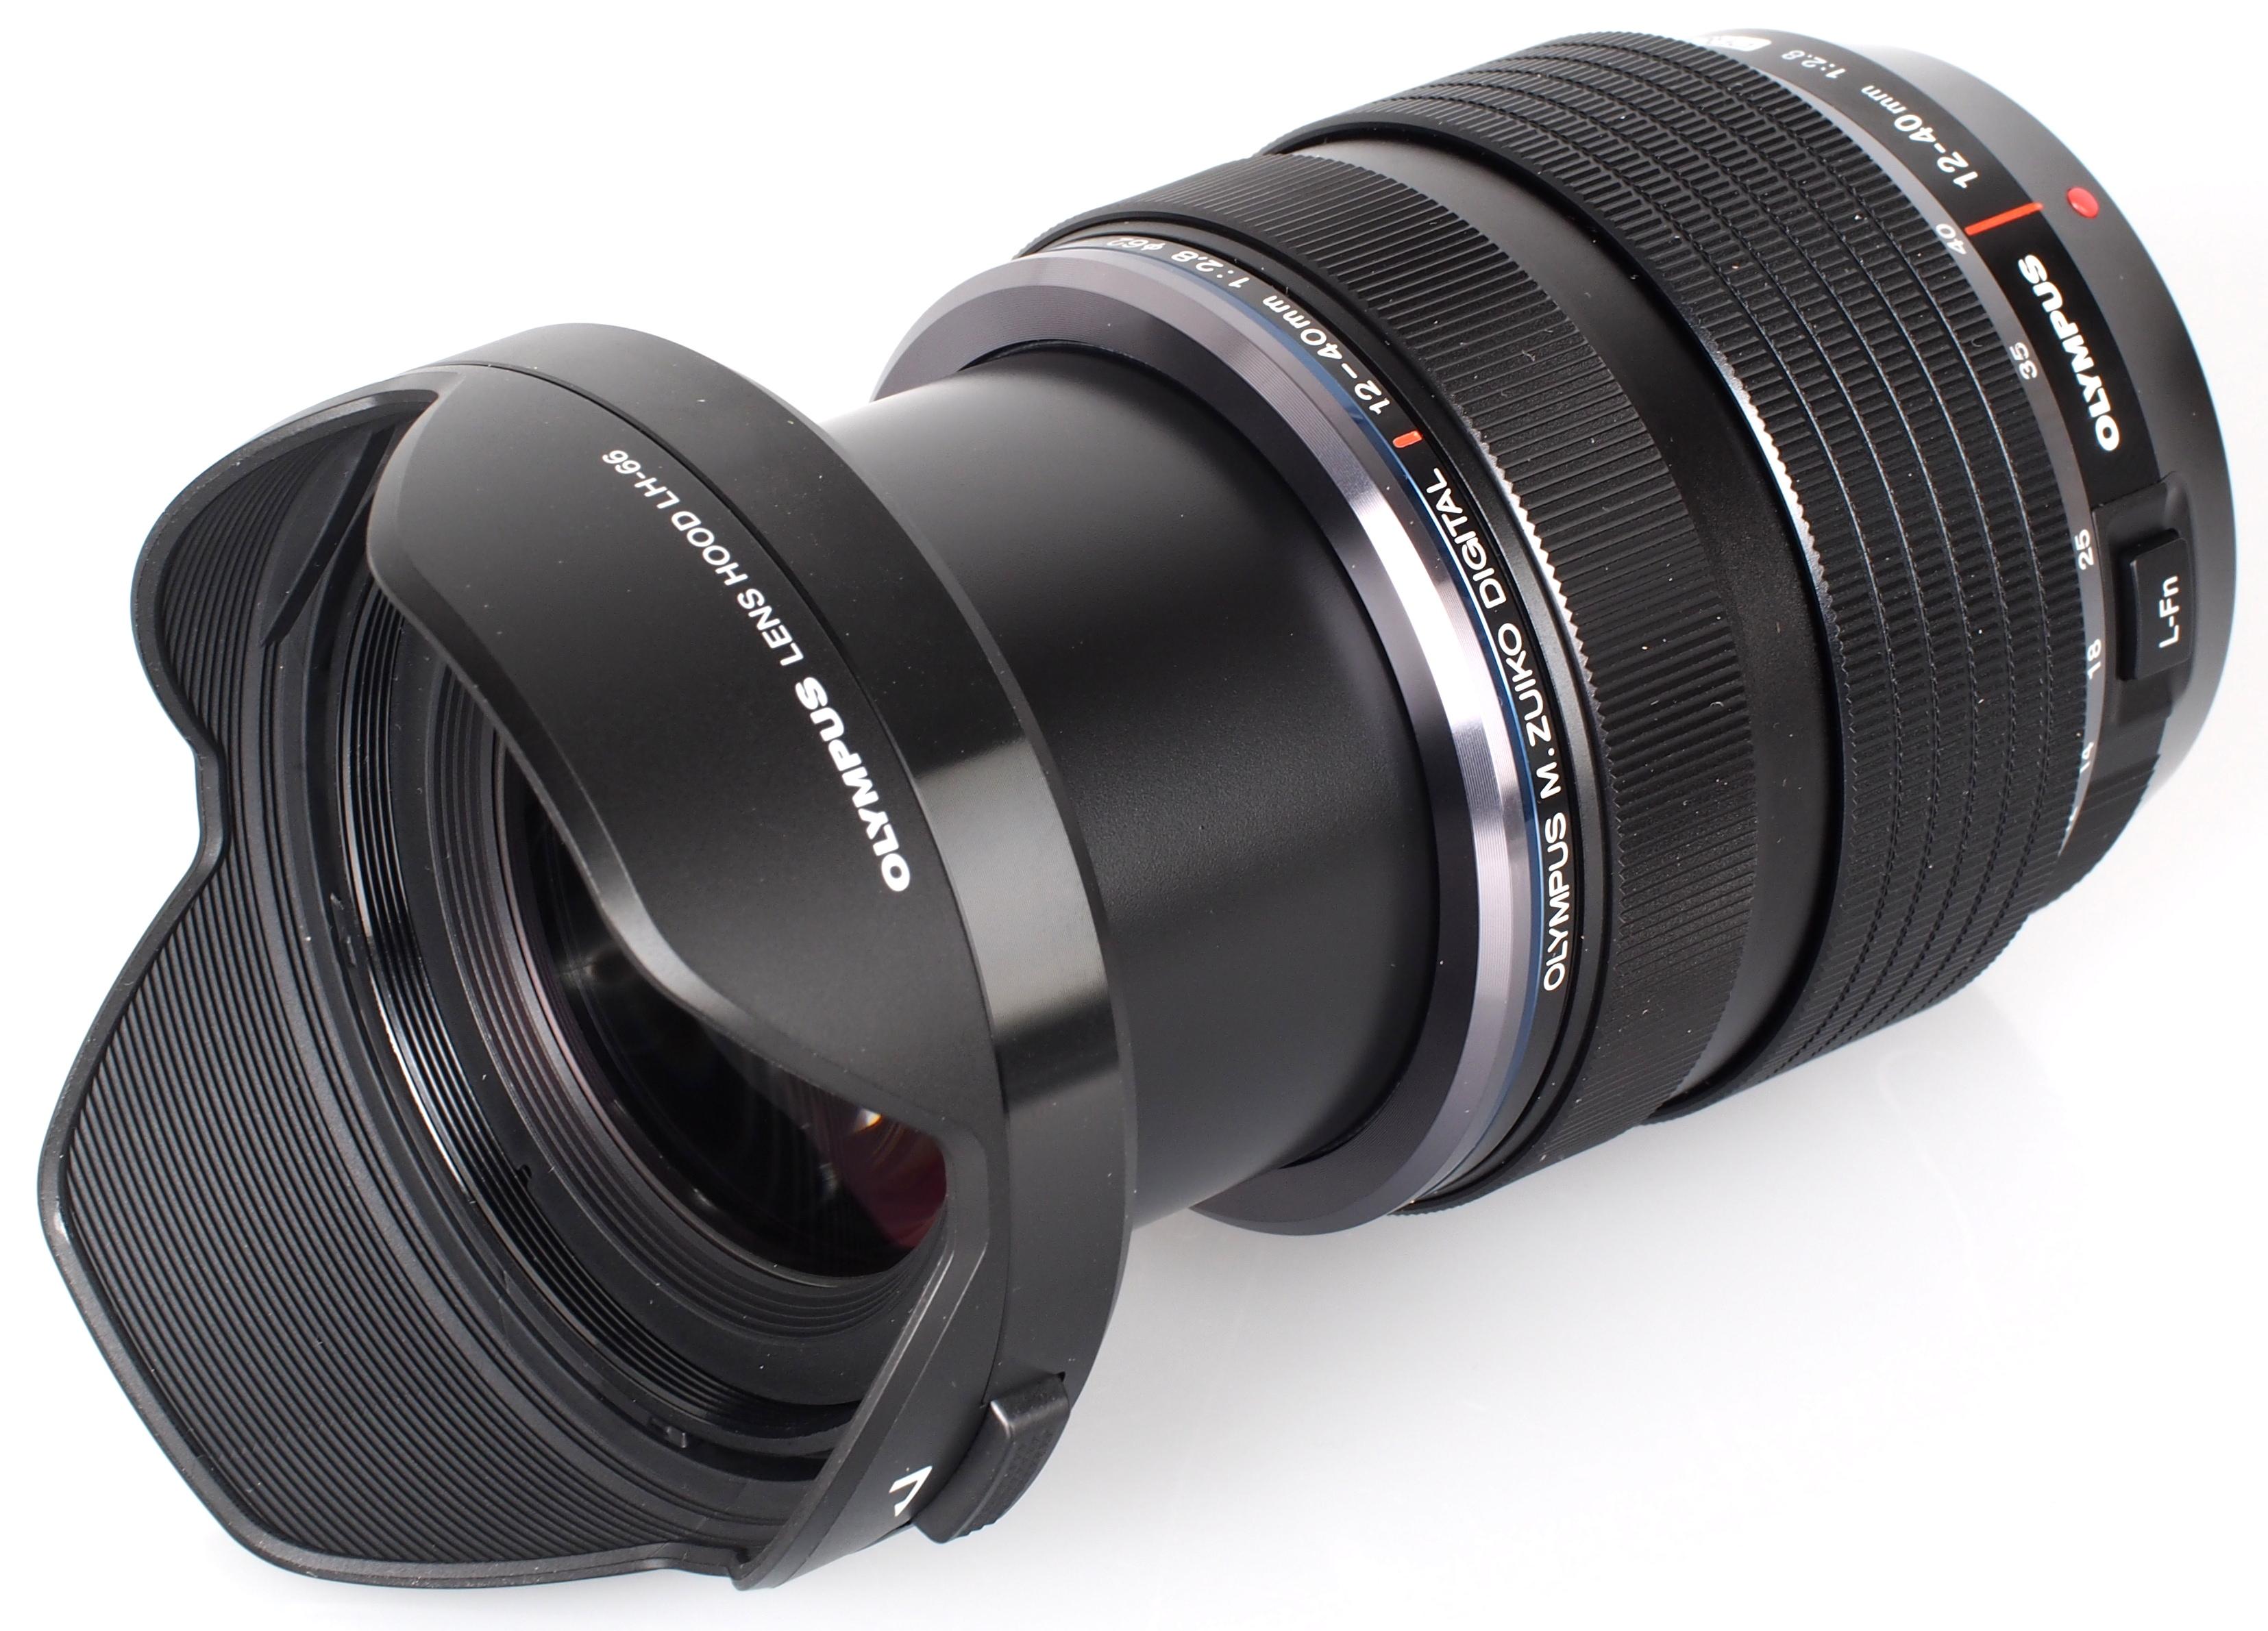 Olympus Digital Camera M.ZUIKO DIGITAL ED 12-40mm F2.8 PRO Lens XP